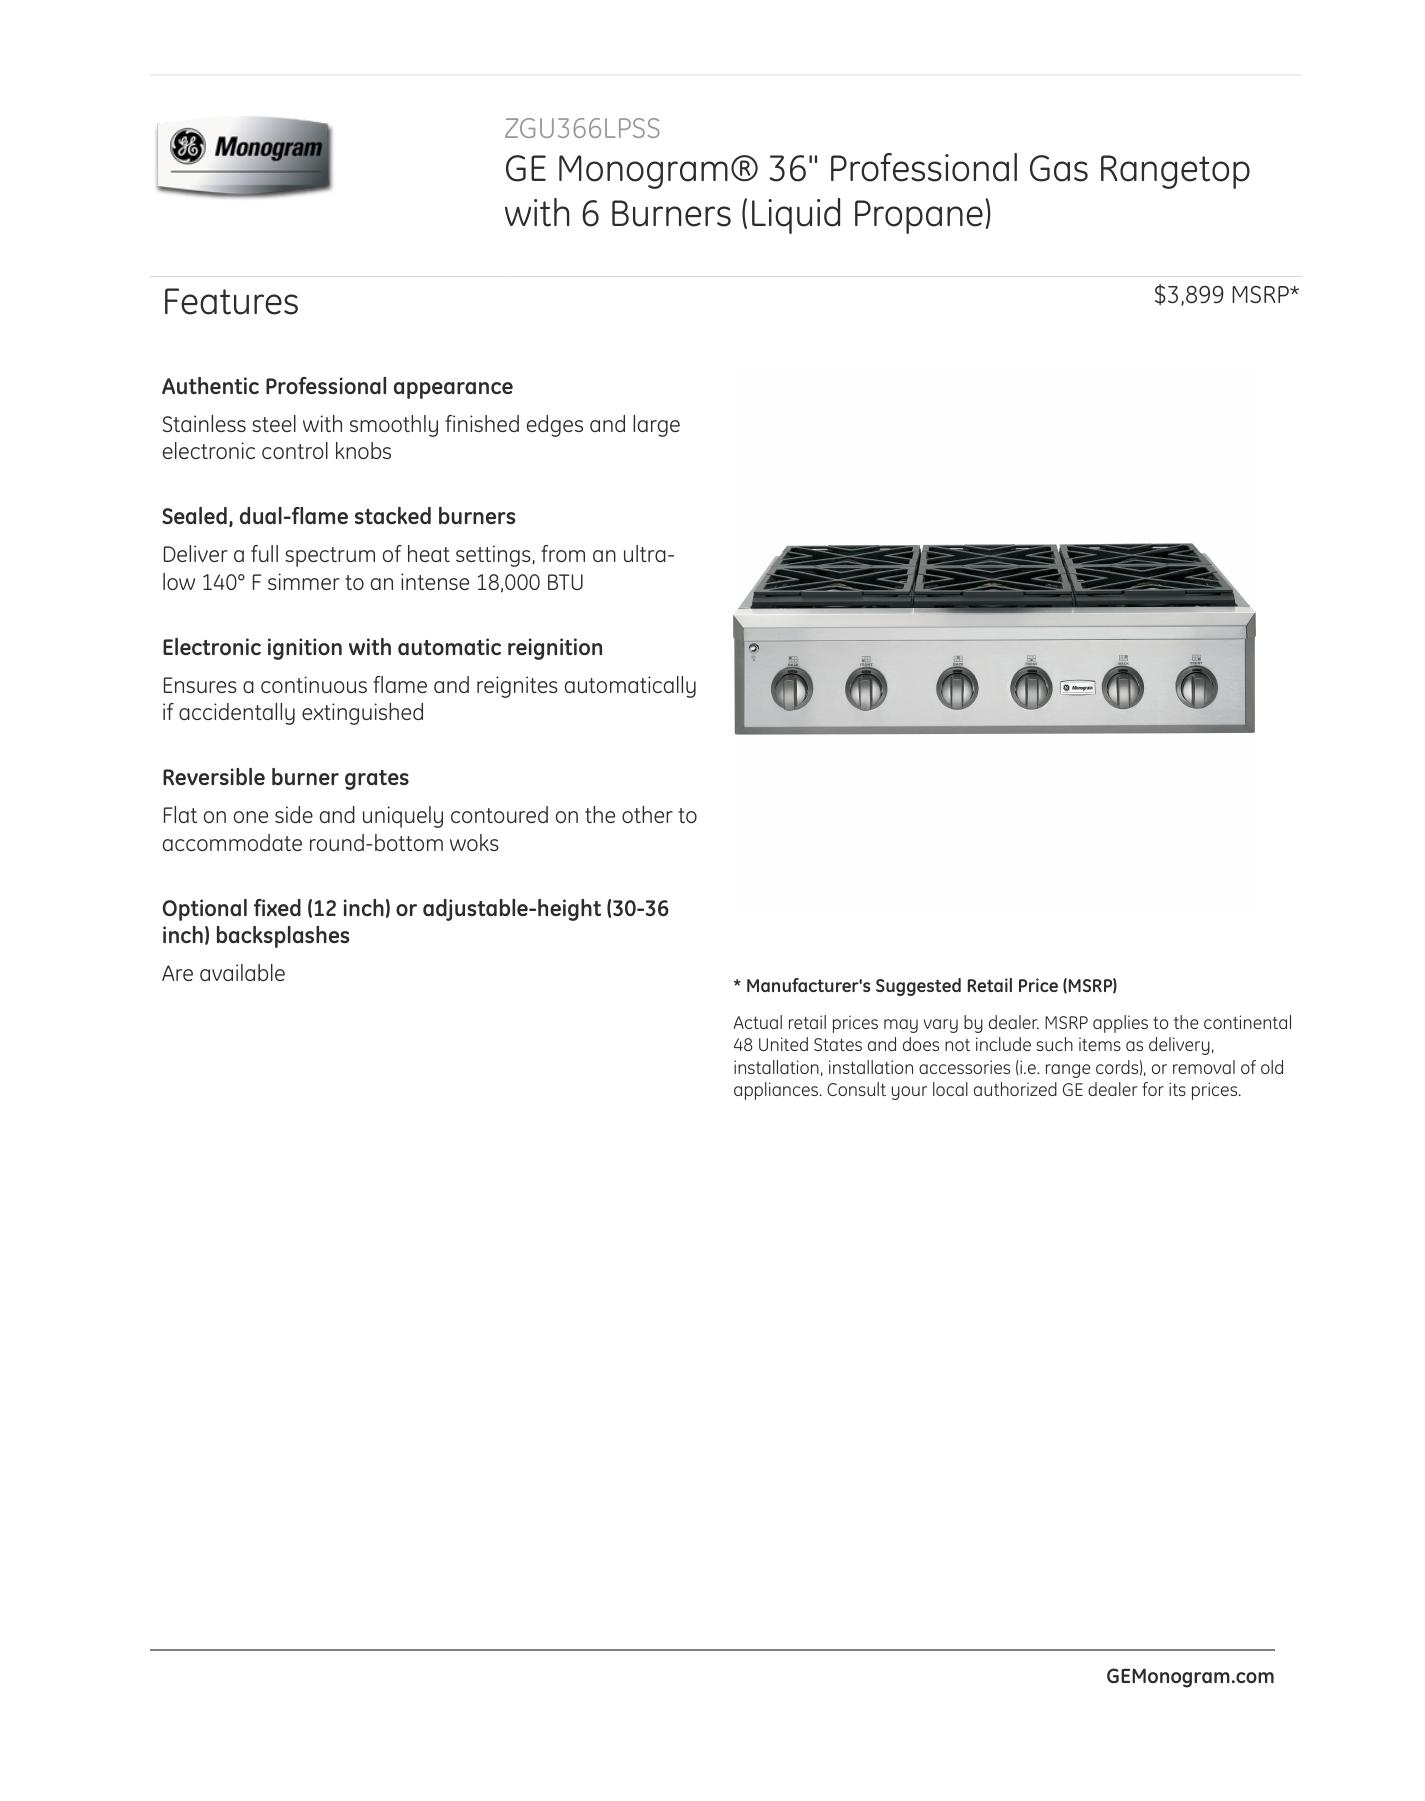 GE Monogram ZGU366NPSS PRINTER FRIENDLY SPECIFICATIONS.PDF   Manualzz